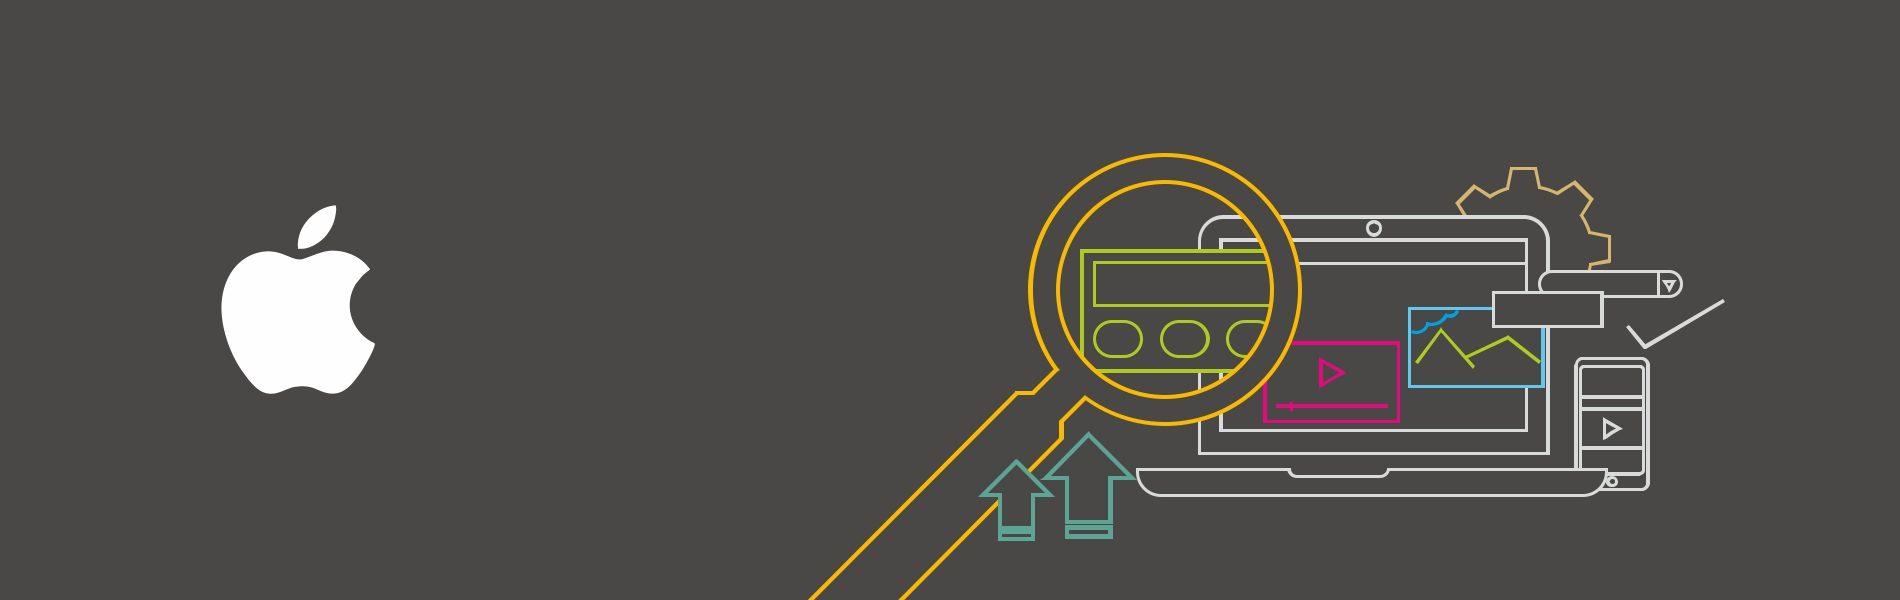 Blog Header How to setup KIF for UI testing